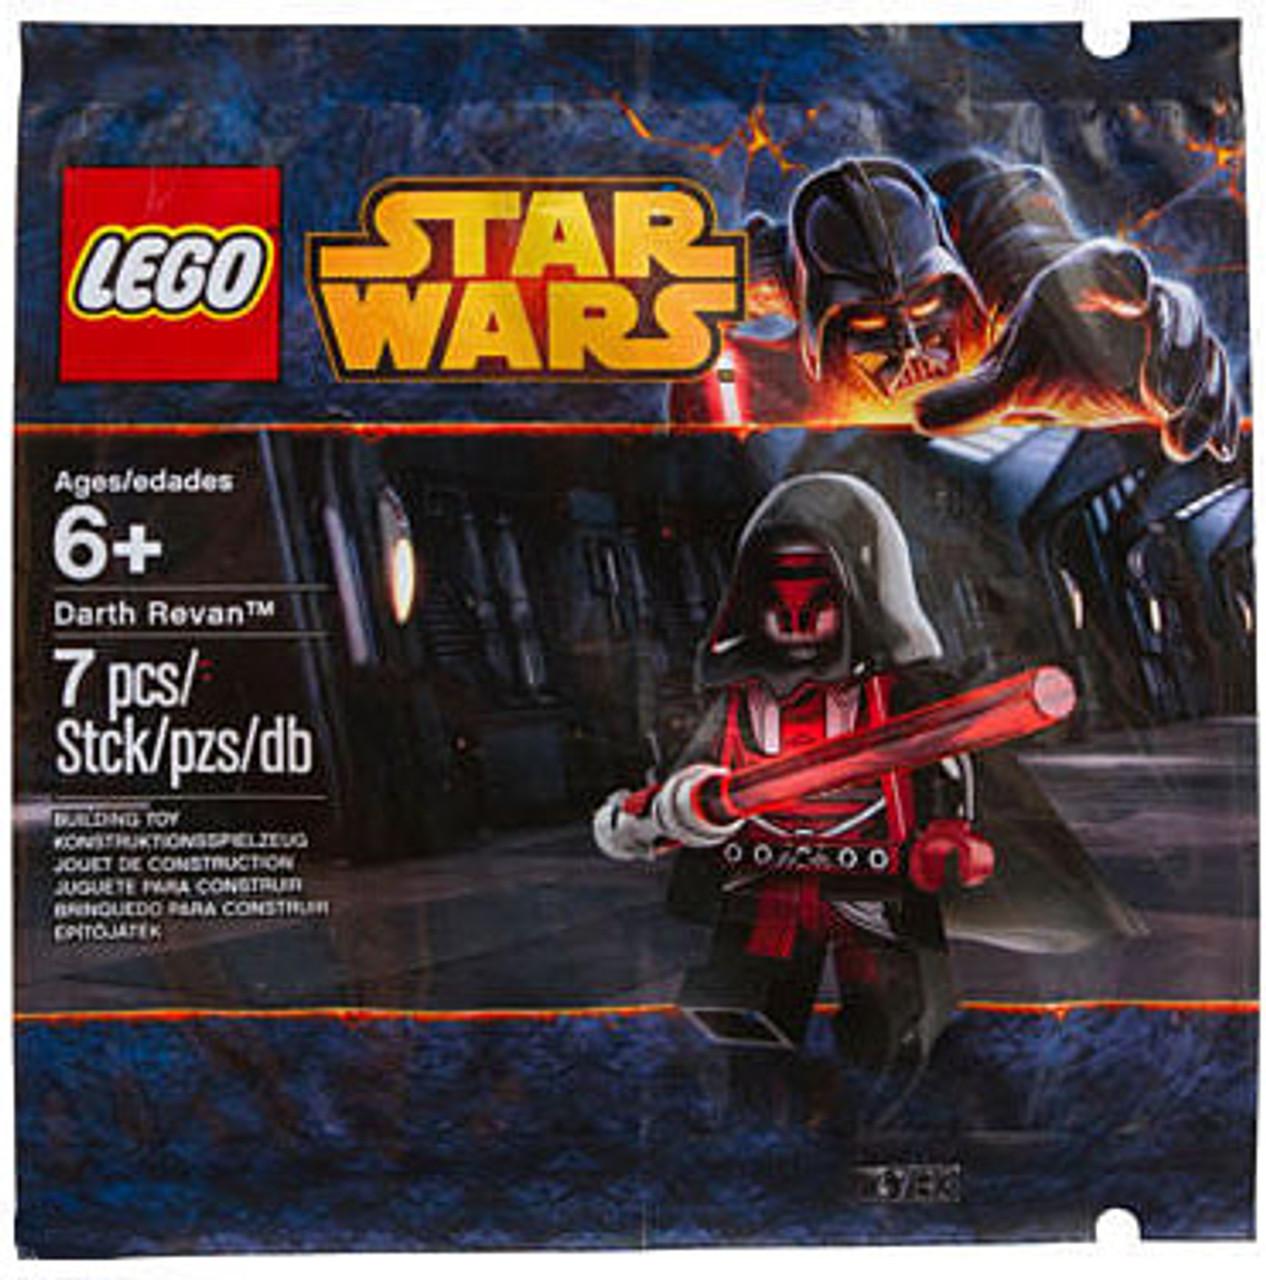 LEGO Star Wars Darth Revan Mini Set #5002123 [Bagged]